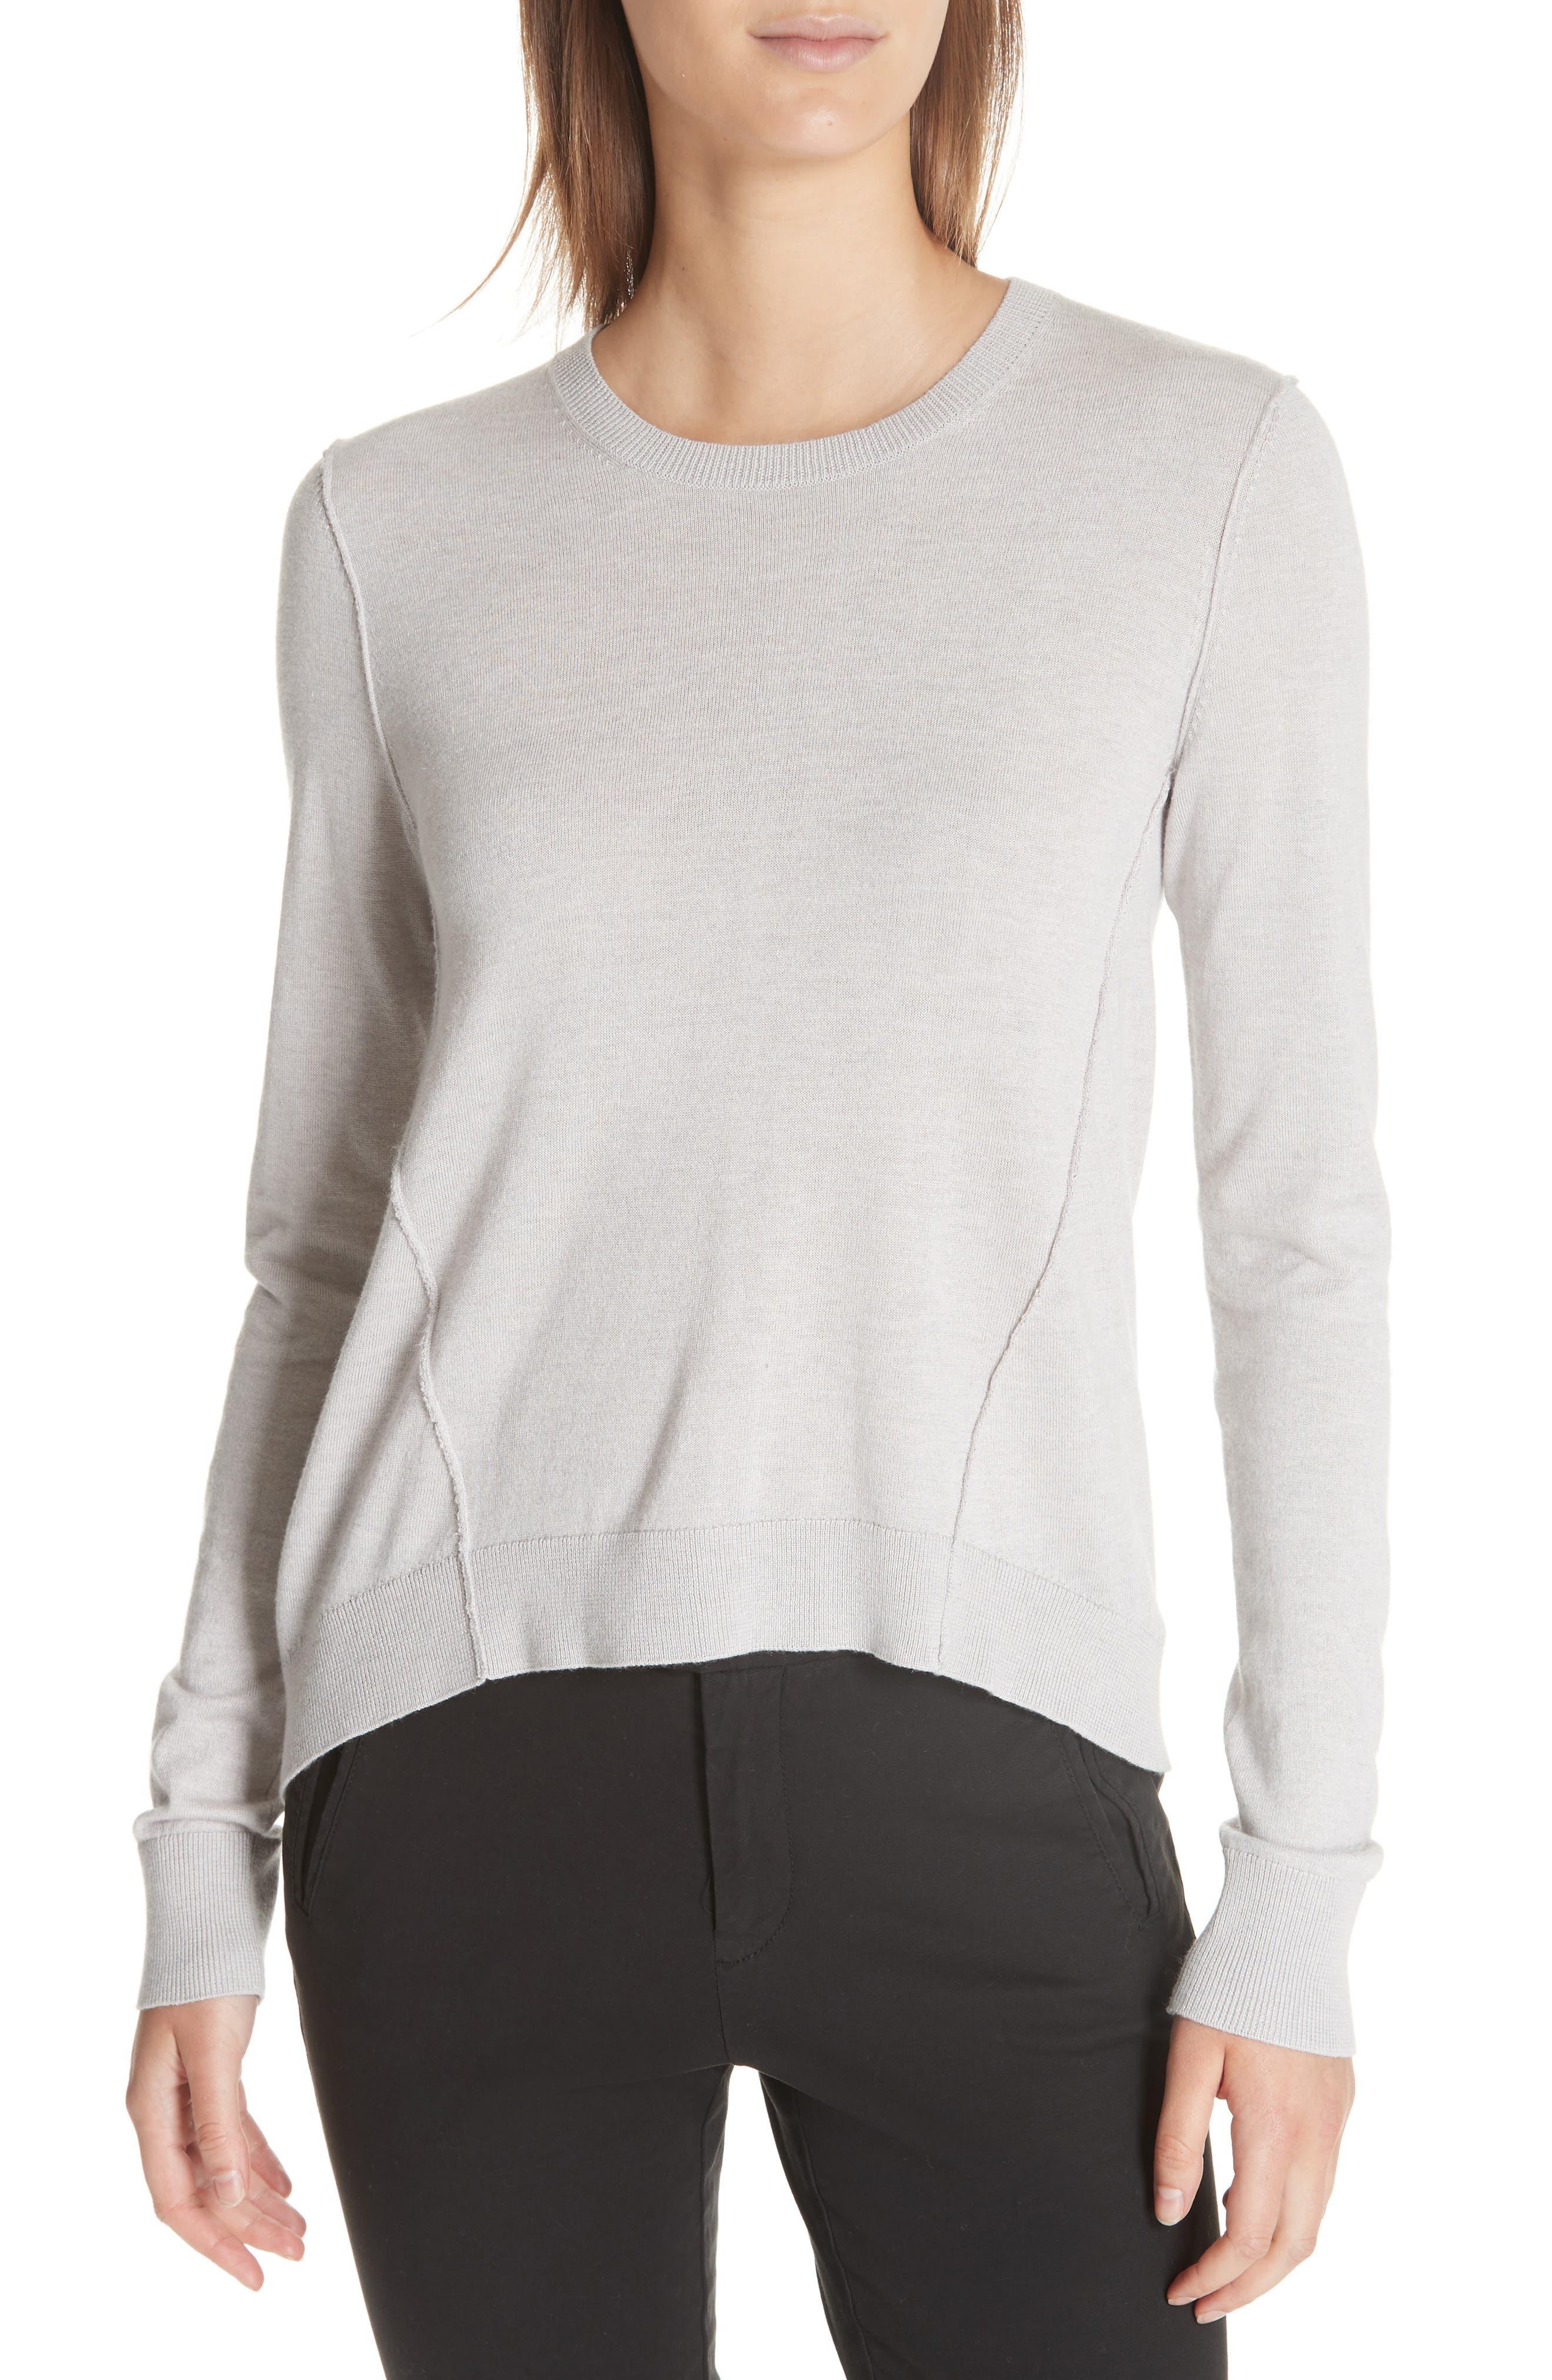 Atm Anthony Thomas Melillo Forward Seam Silk, Wool & Cashmere Sweater, Grey